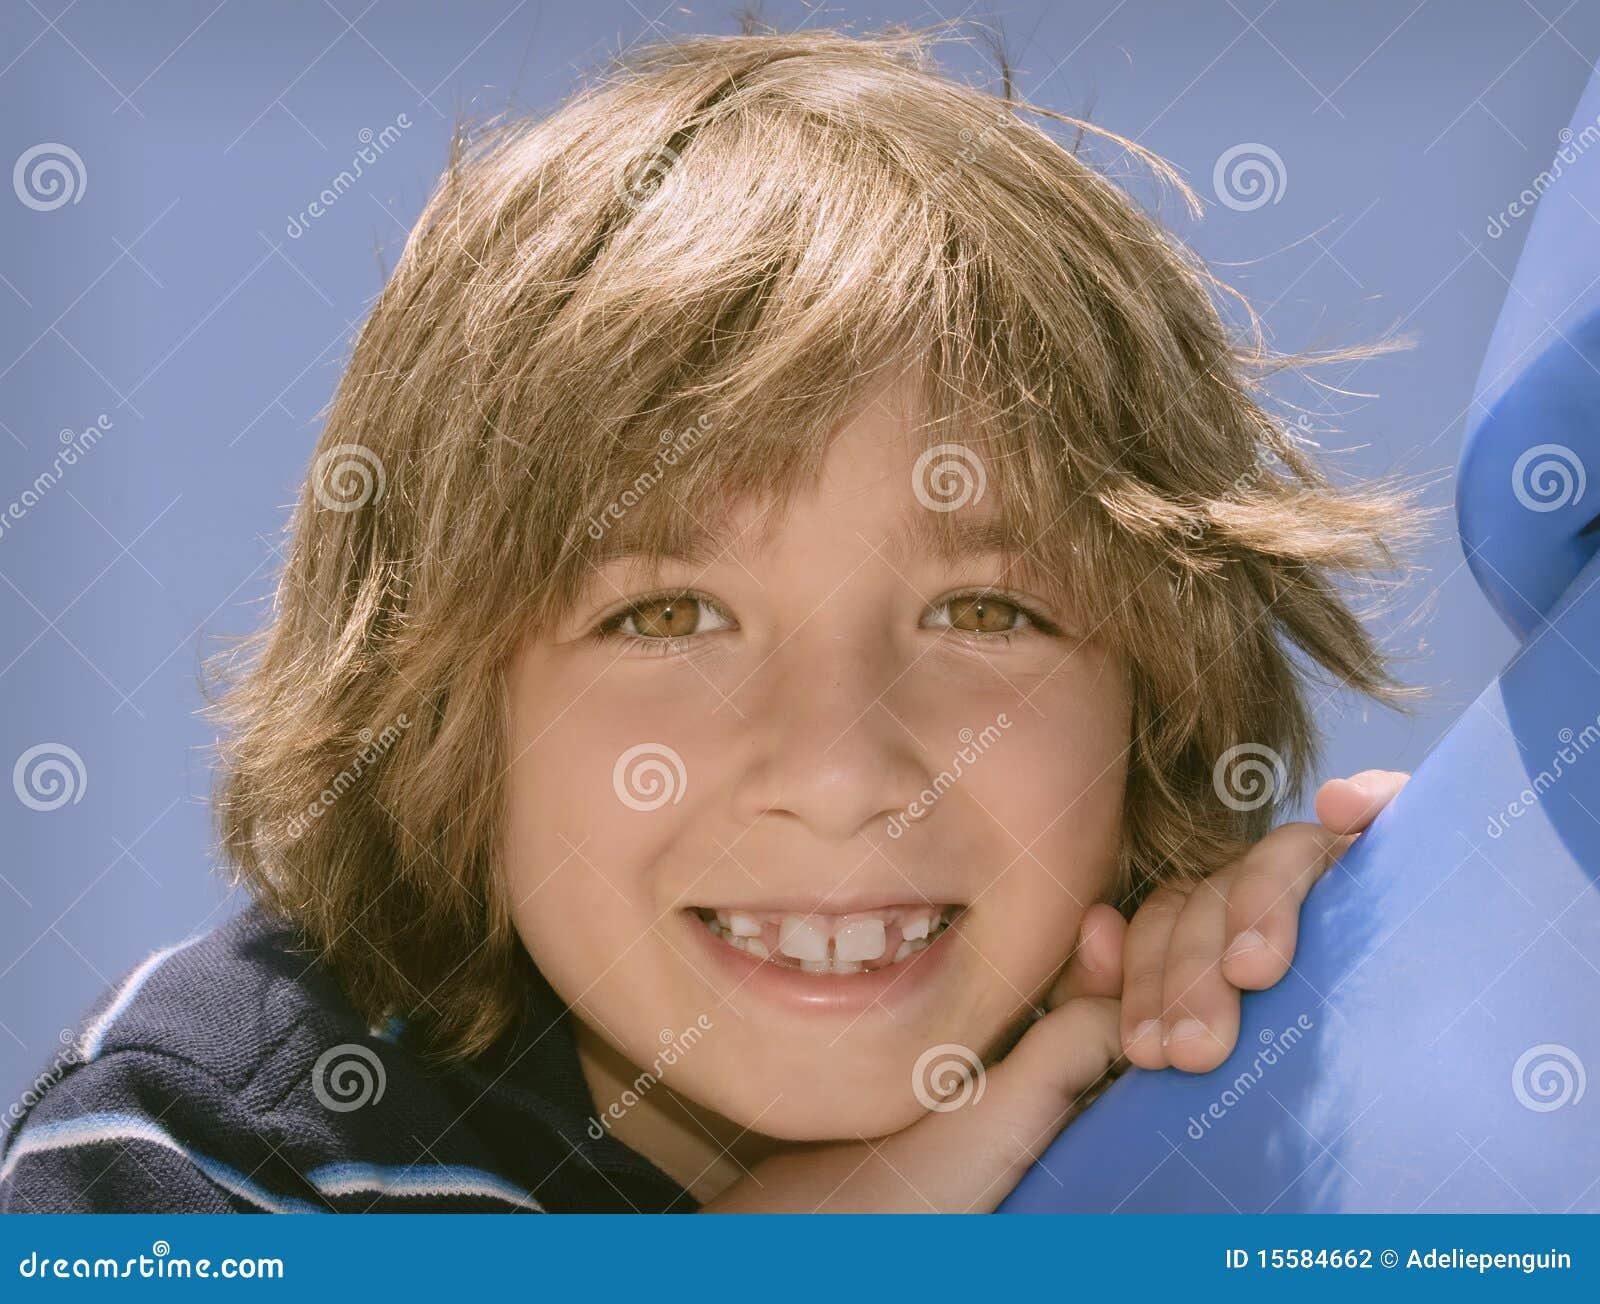 Boy With Big Smile Stock Photography Image 15584662